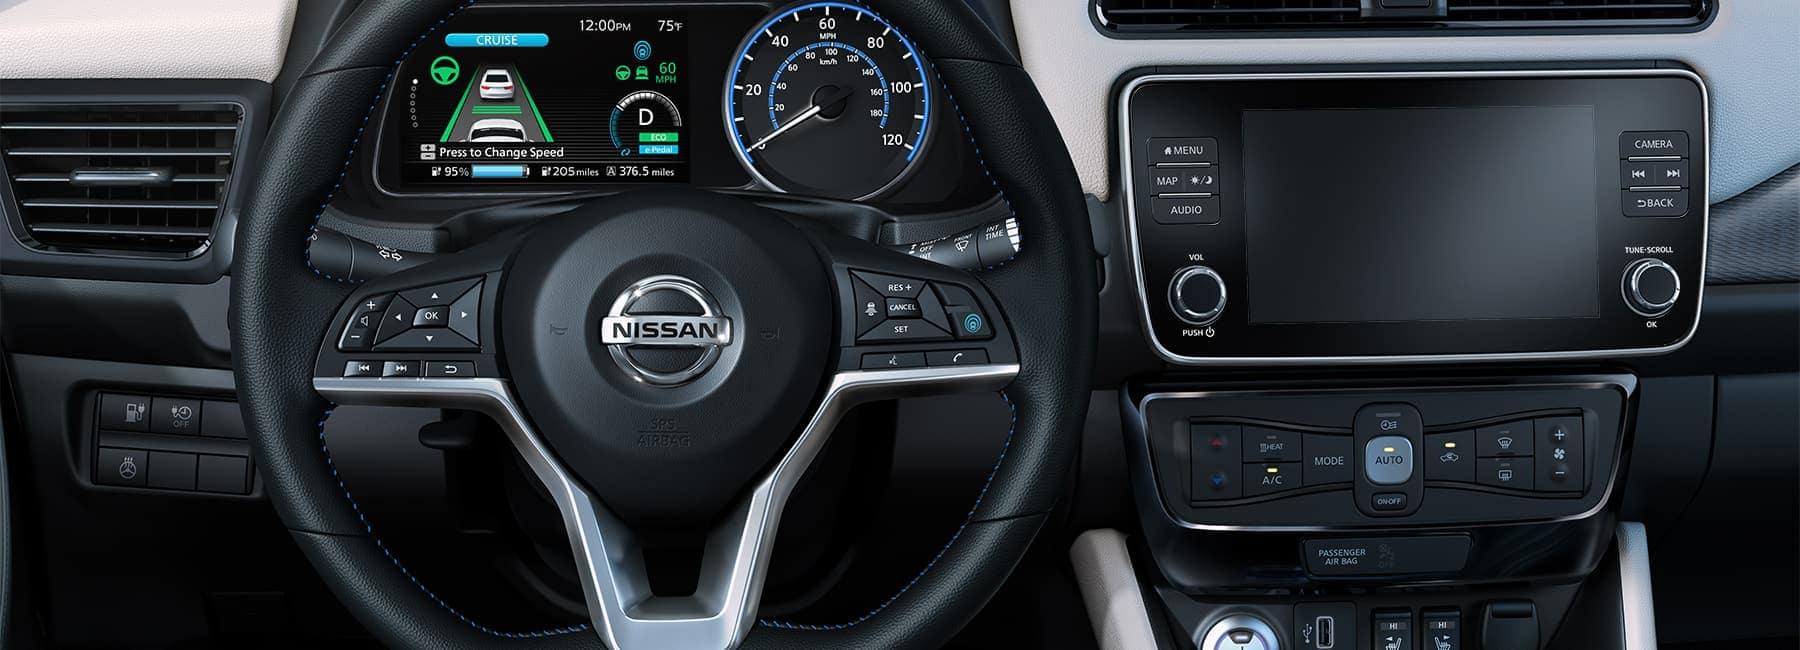 2020-nissan-leaf-interior-steering-wheel (1)